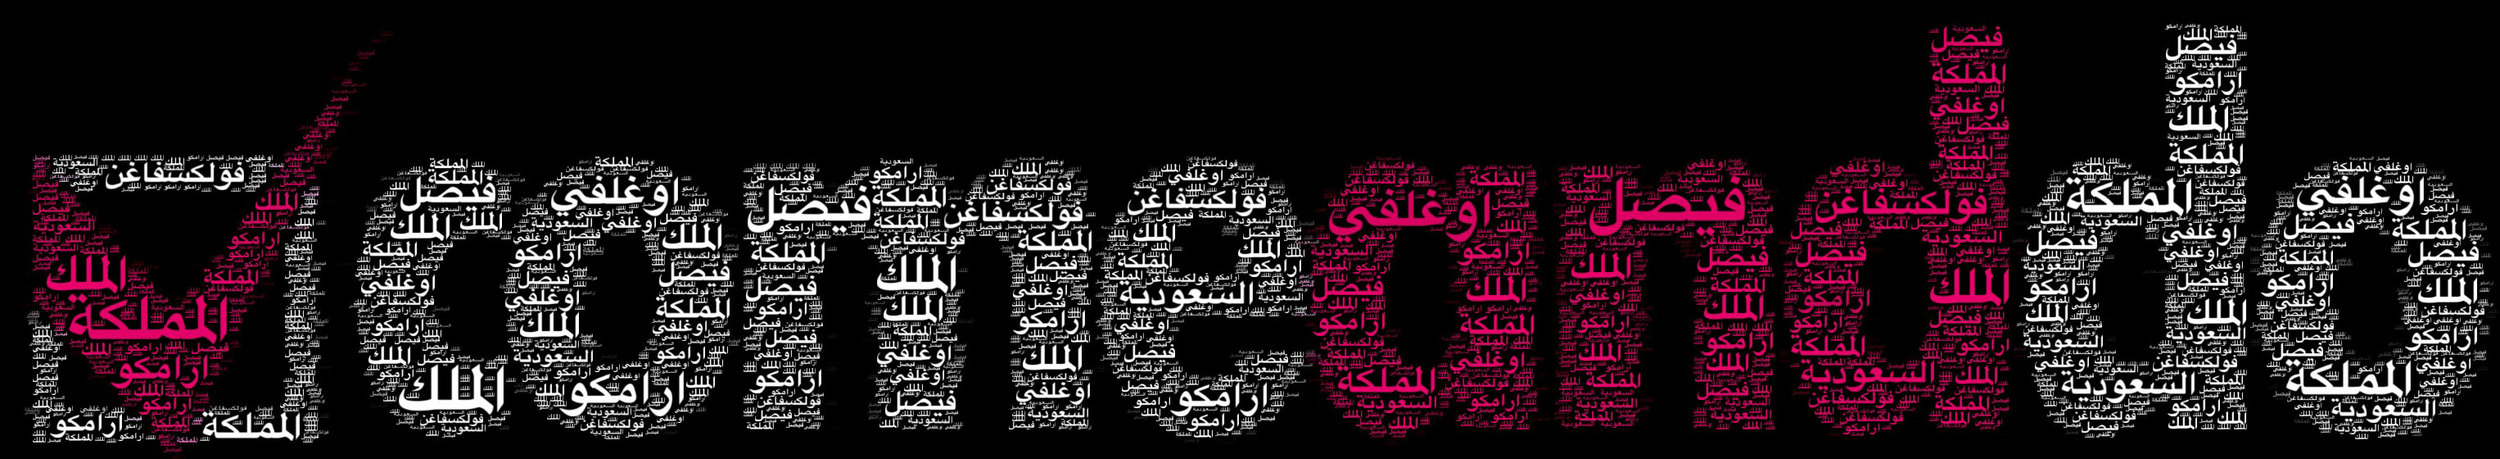 CloudWord-arabic.JPG